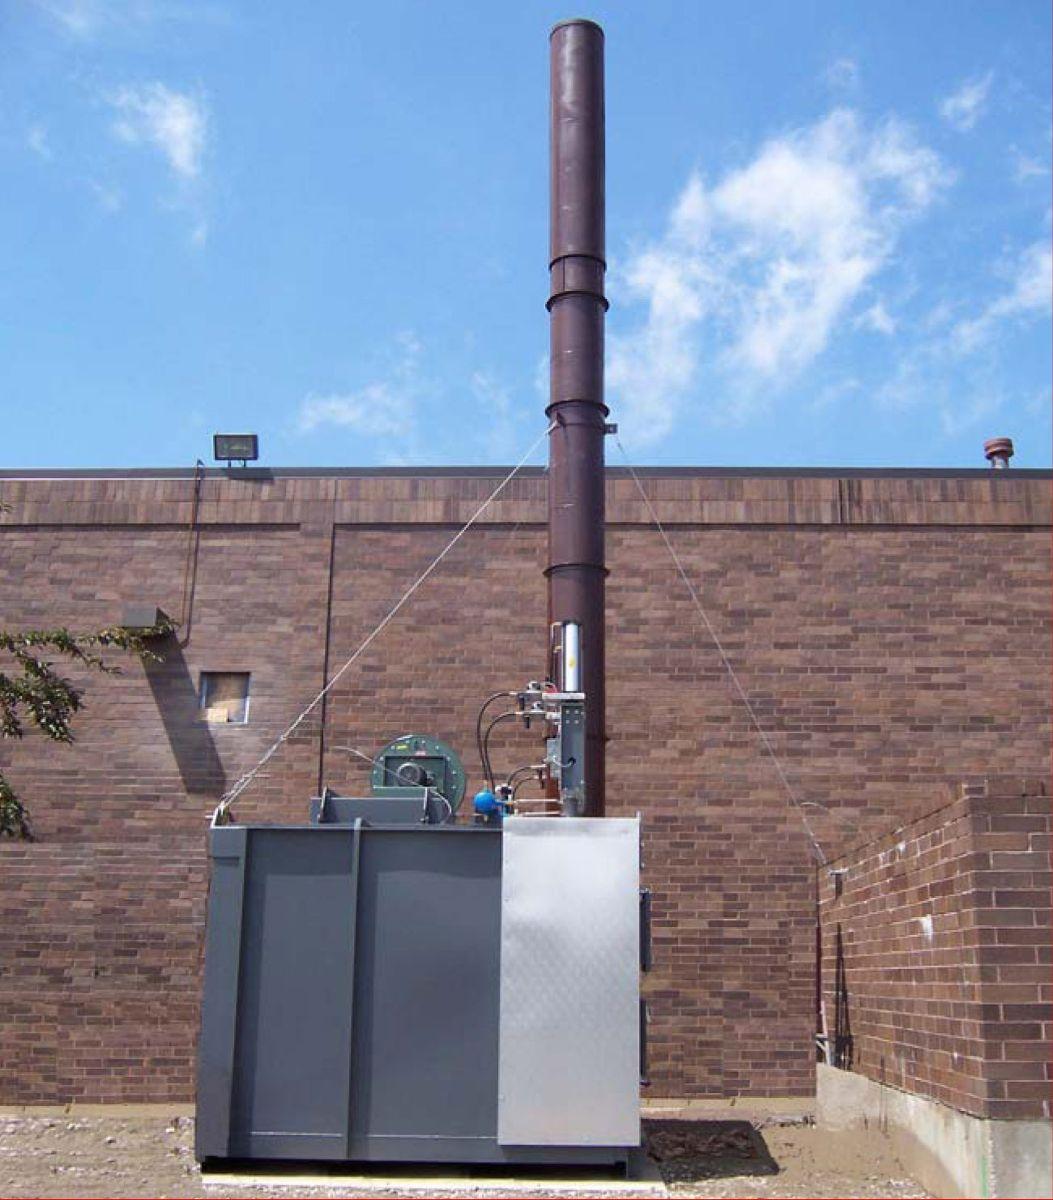 Regenerative Thermal Oxidizer, TRITON Series, installed for Custom Coater using Turnkey Method